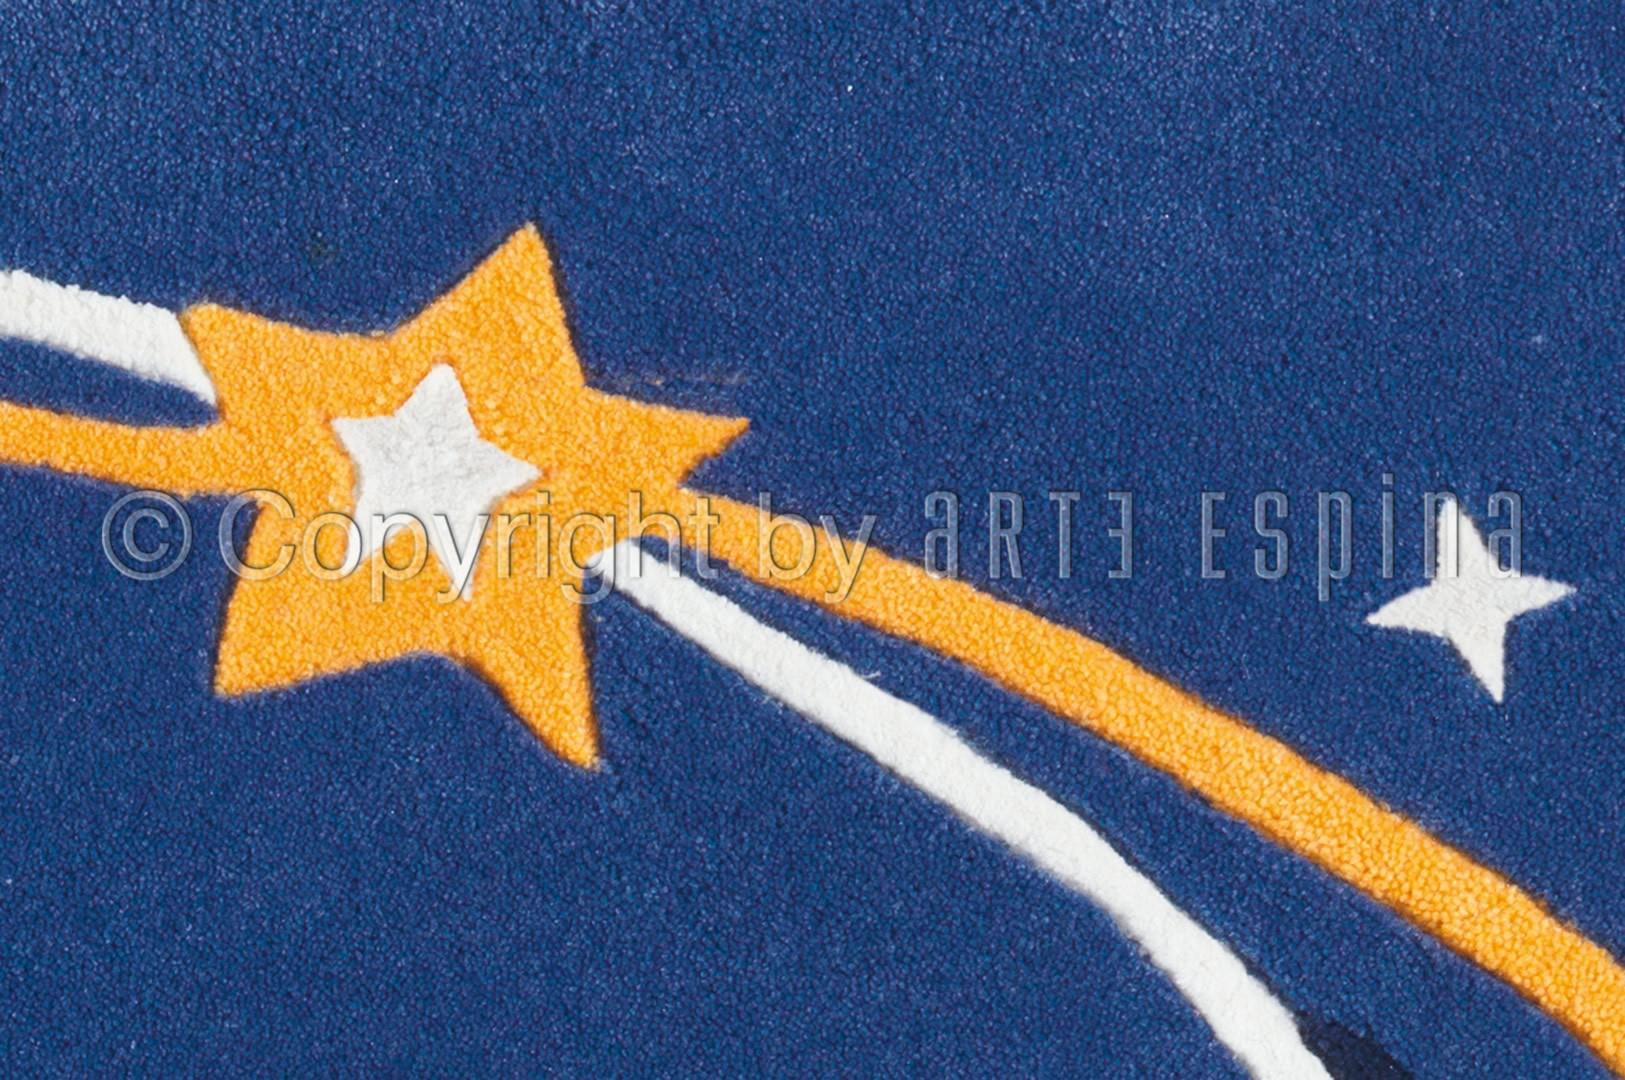 Tapis fluorescent pour enfant bleu Rocket Glowy Arte Espina